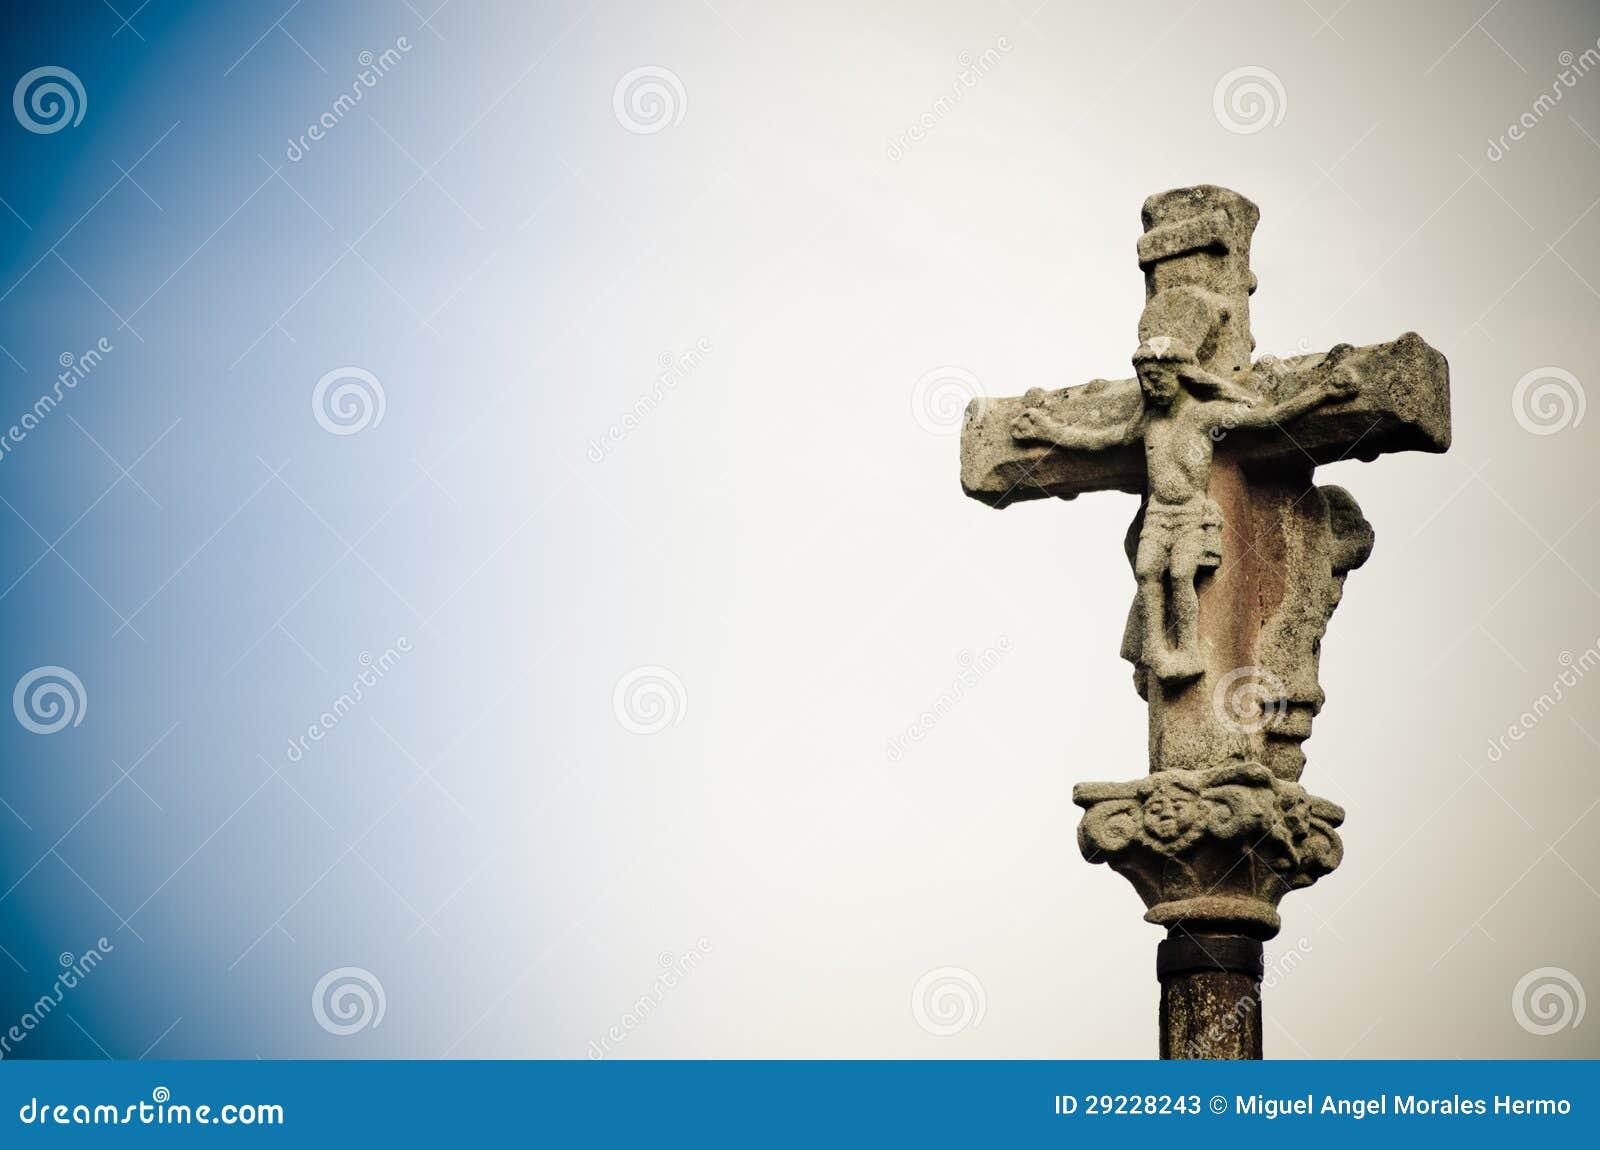 Download Cruz de pedra imagem de stock. Imagem de sculpture, cityscape - 29228243